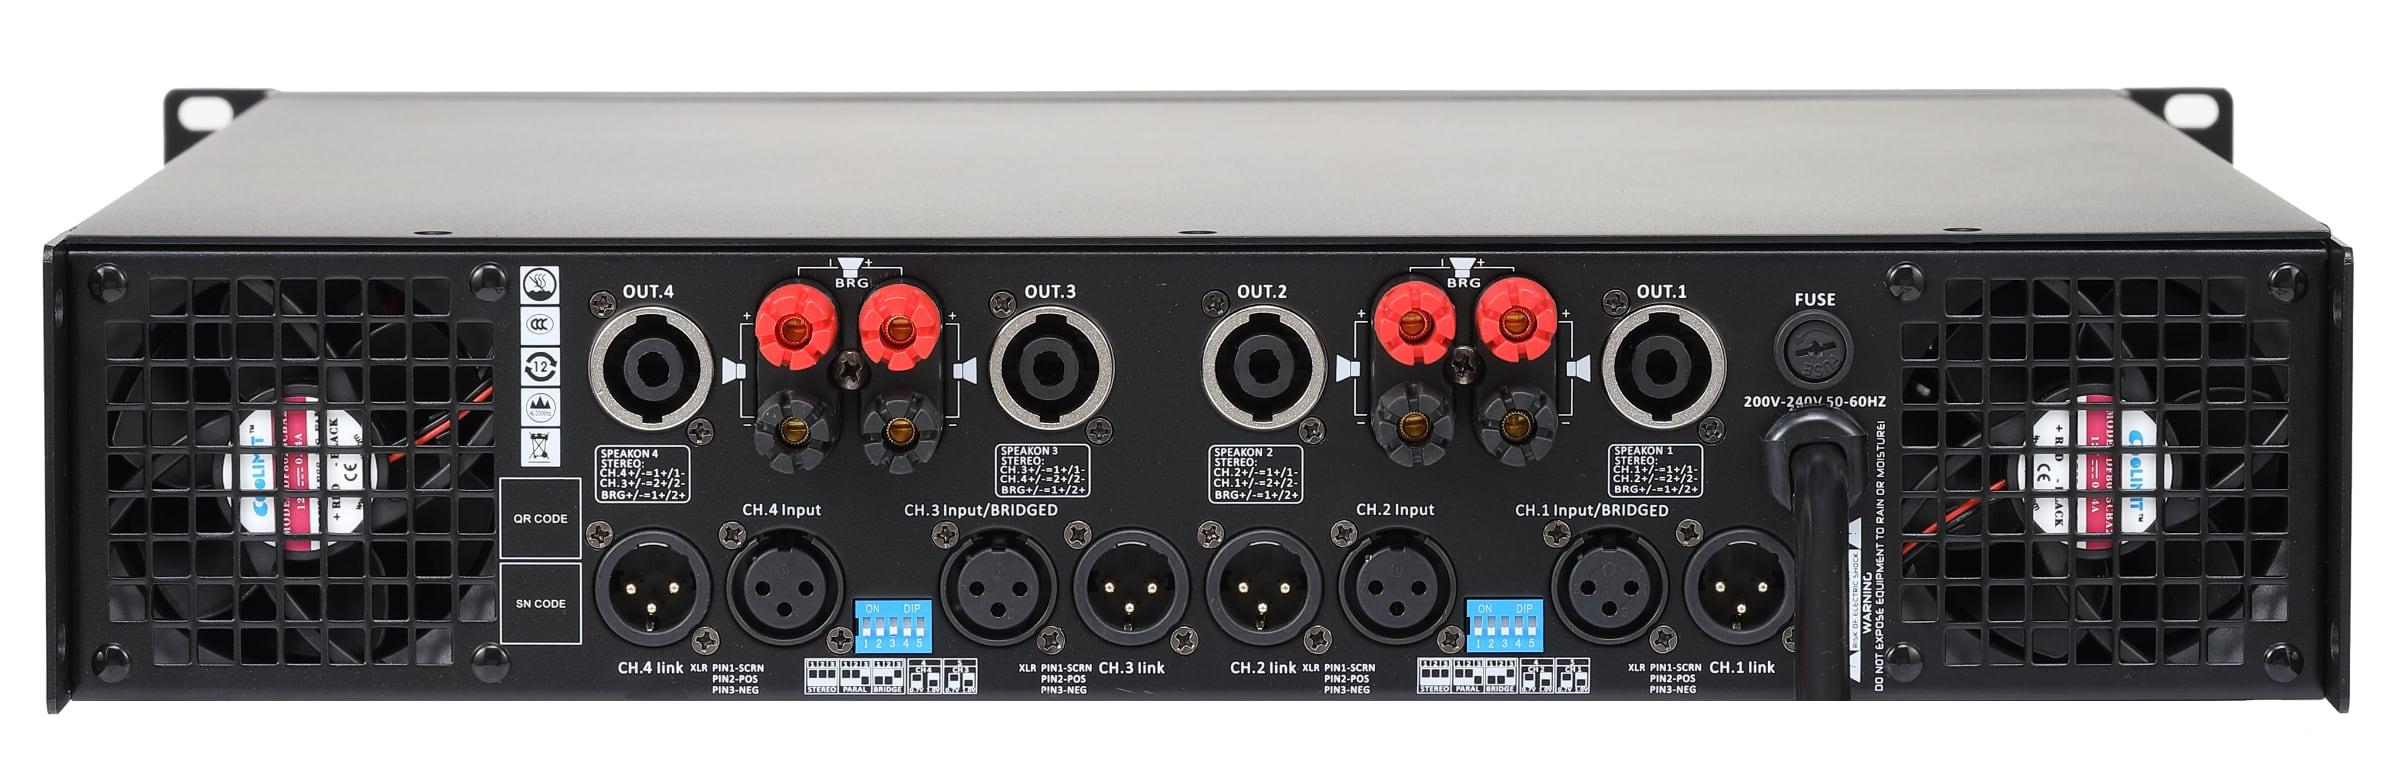 Công suất AAP TD-4004